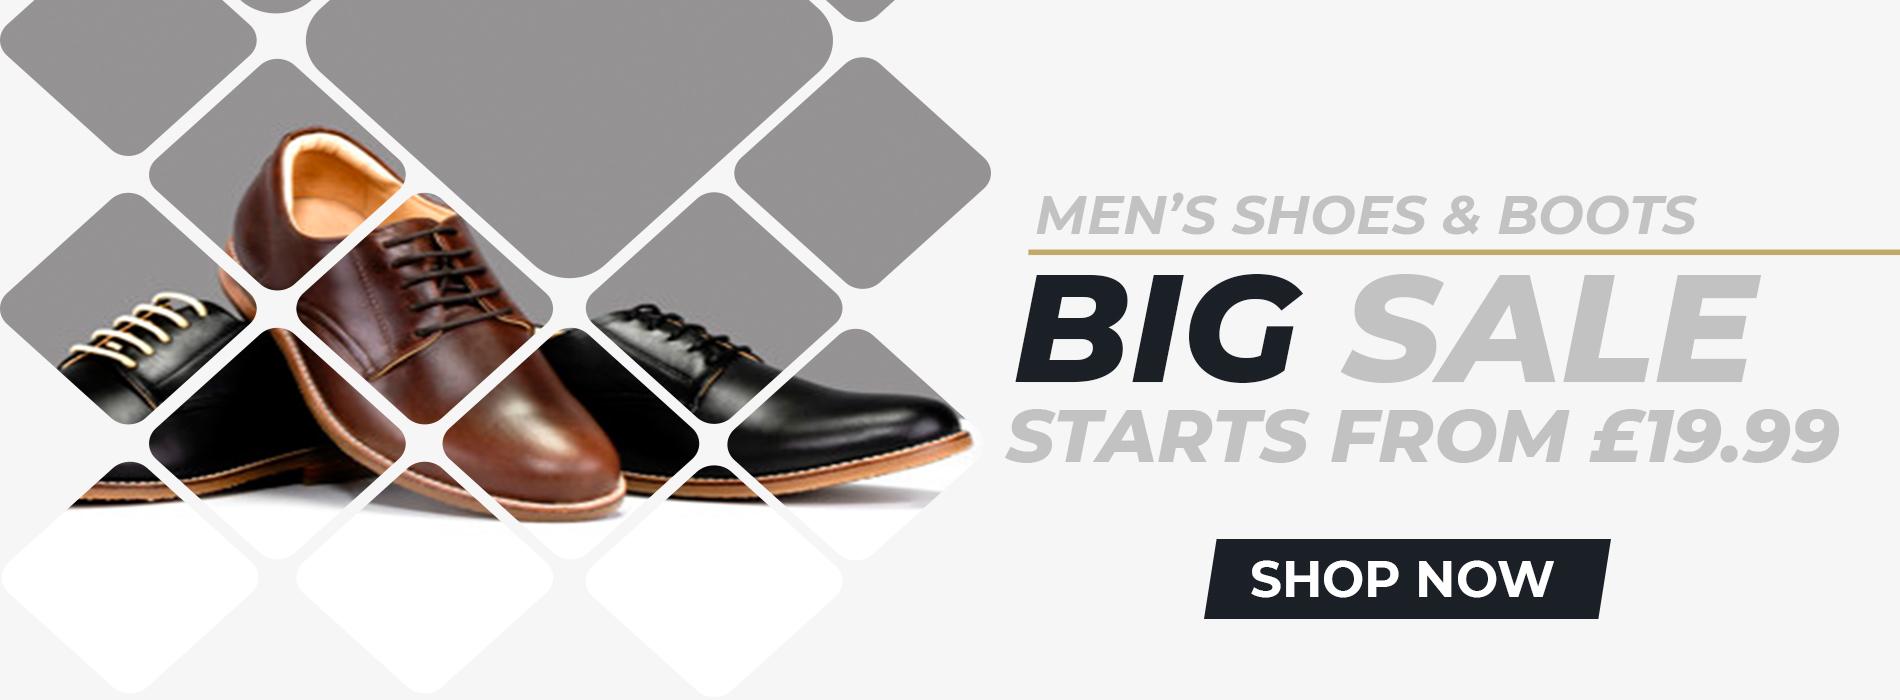 https://www.sirri.co.uk/men/shoes.html